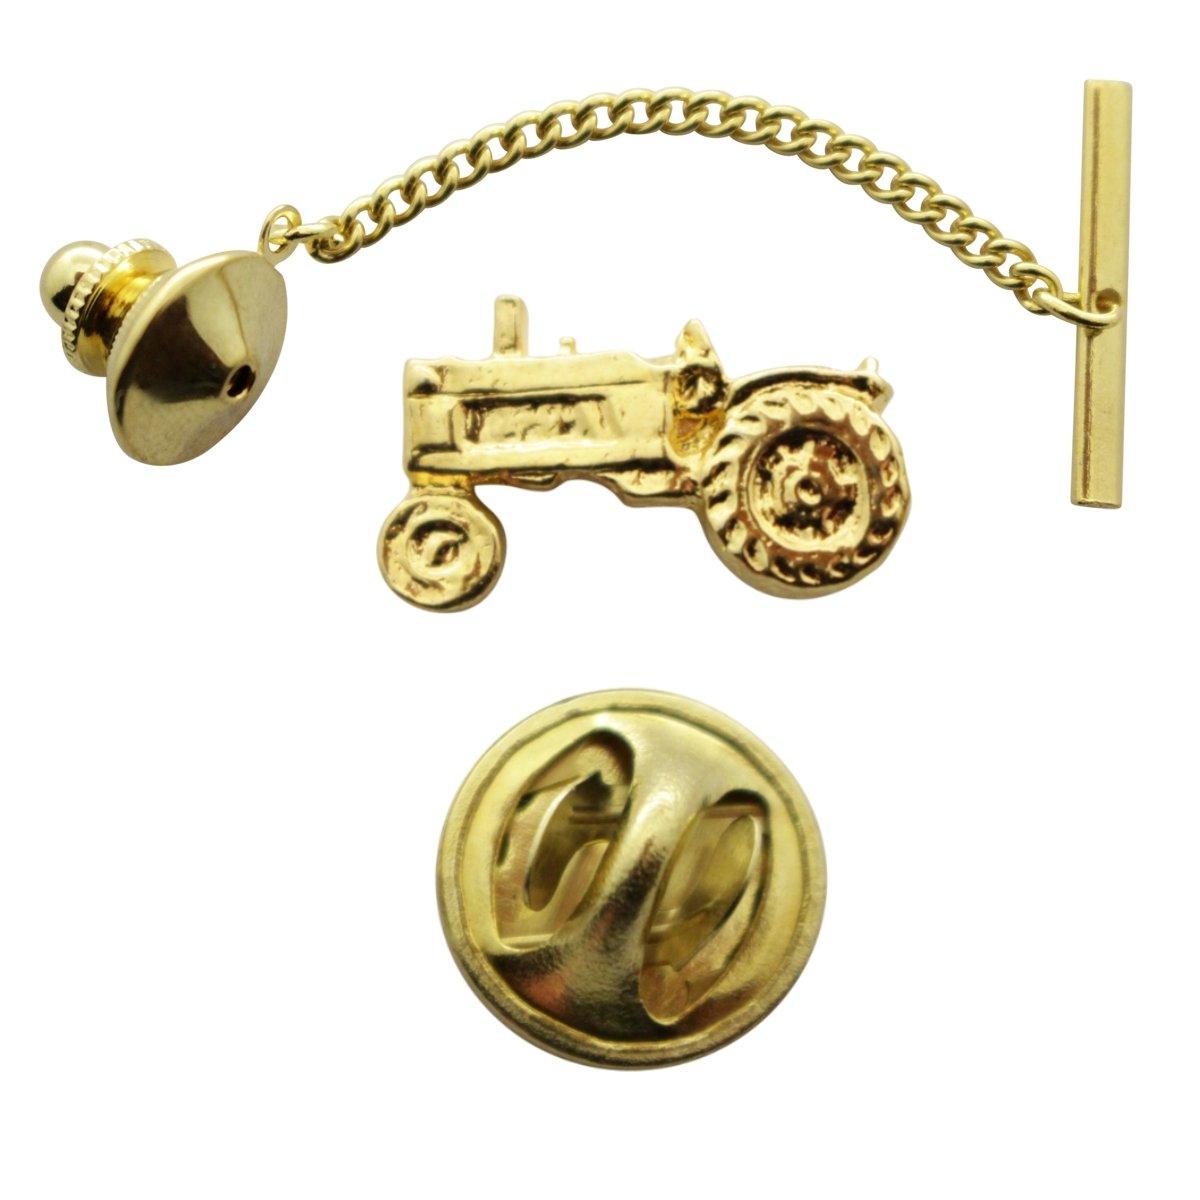 Tractor Tie Tack ~ 24K Gold ~ Tie Tack or Pin ~ Sarah's Treats & Treasures G.G. Harris STT-M935-G-TT